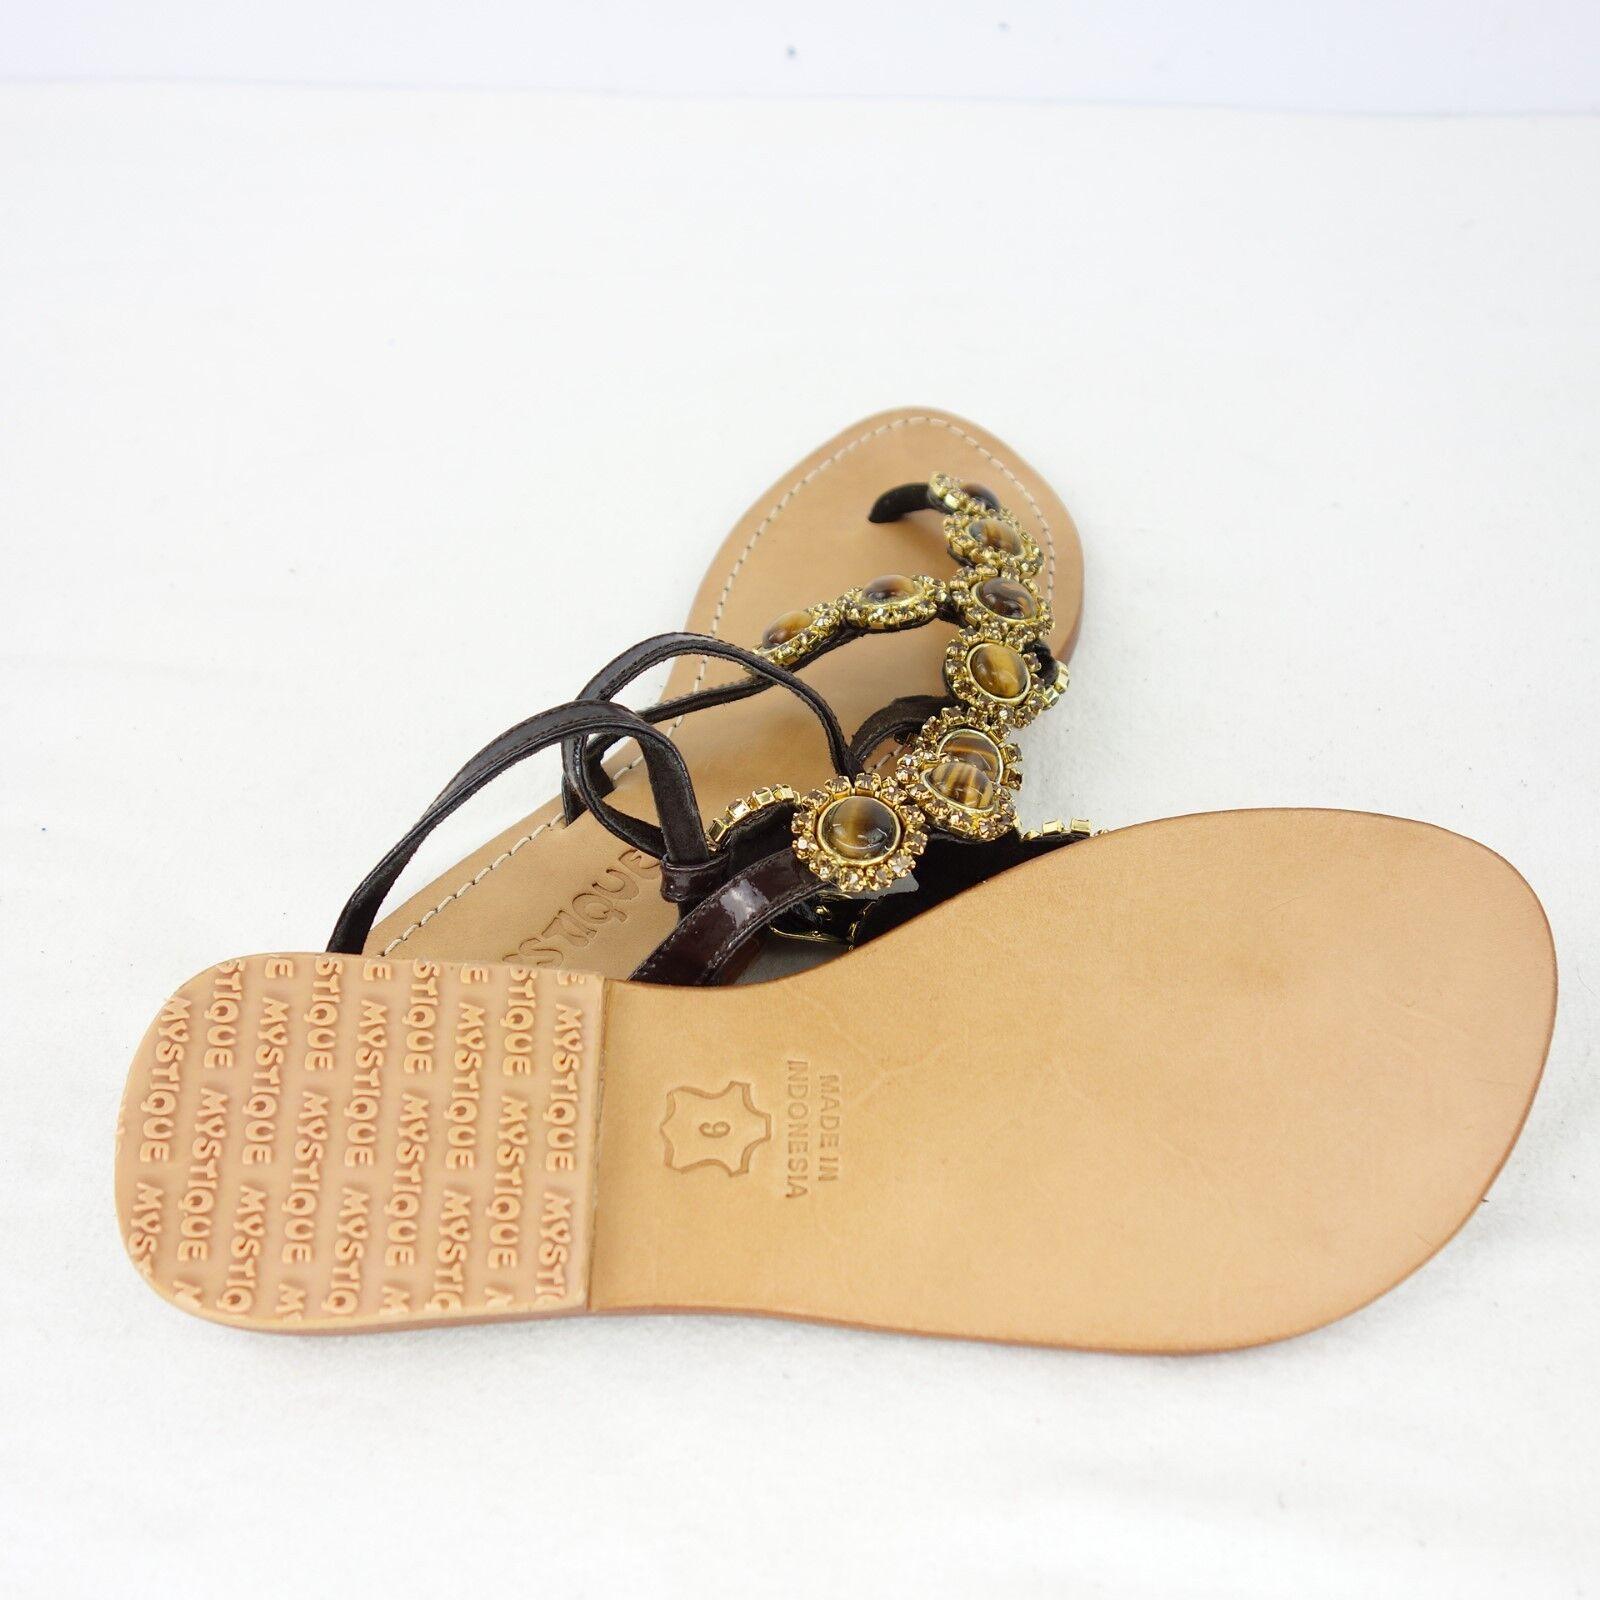 MYSTIQUE Damen 40 Sandalen Zehentrenner Schuhe Gr 40 Damen 42 Leder Ziersteine NP 219 NEU 8e31db